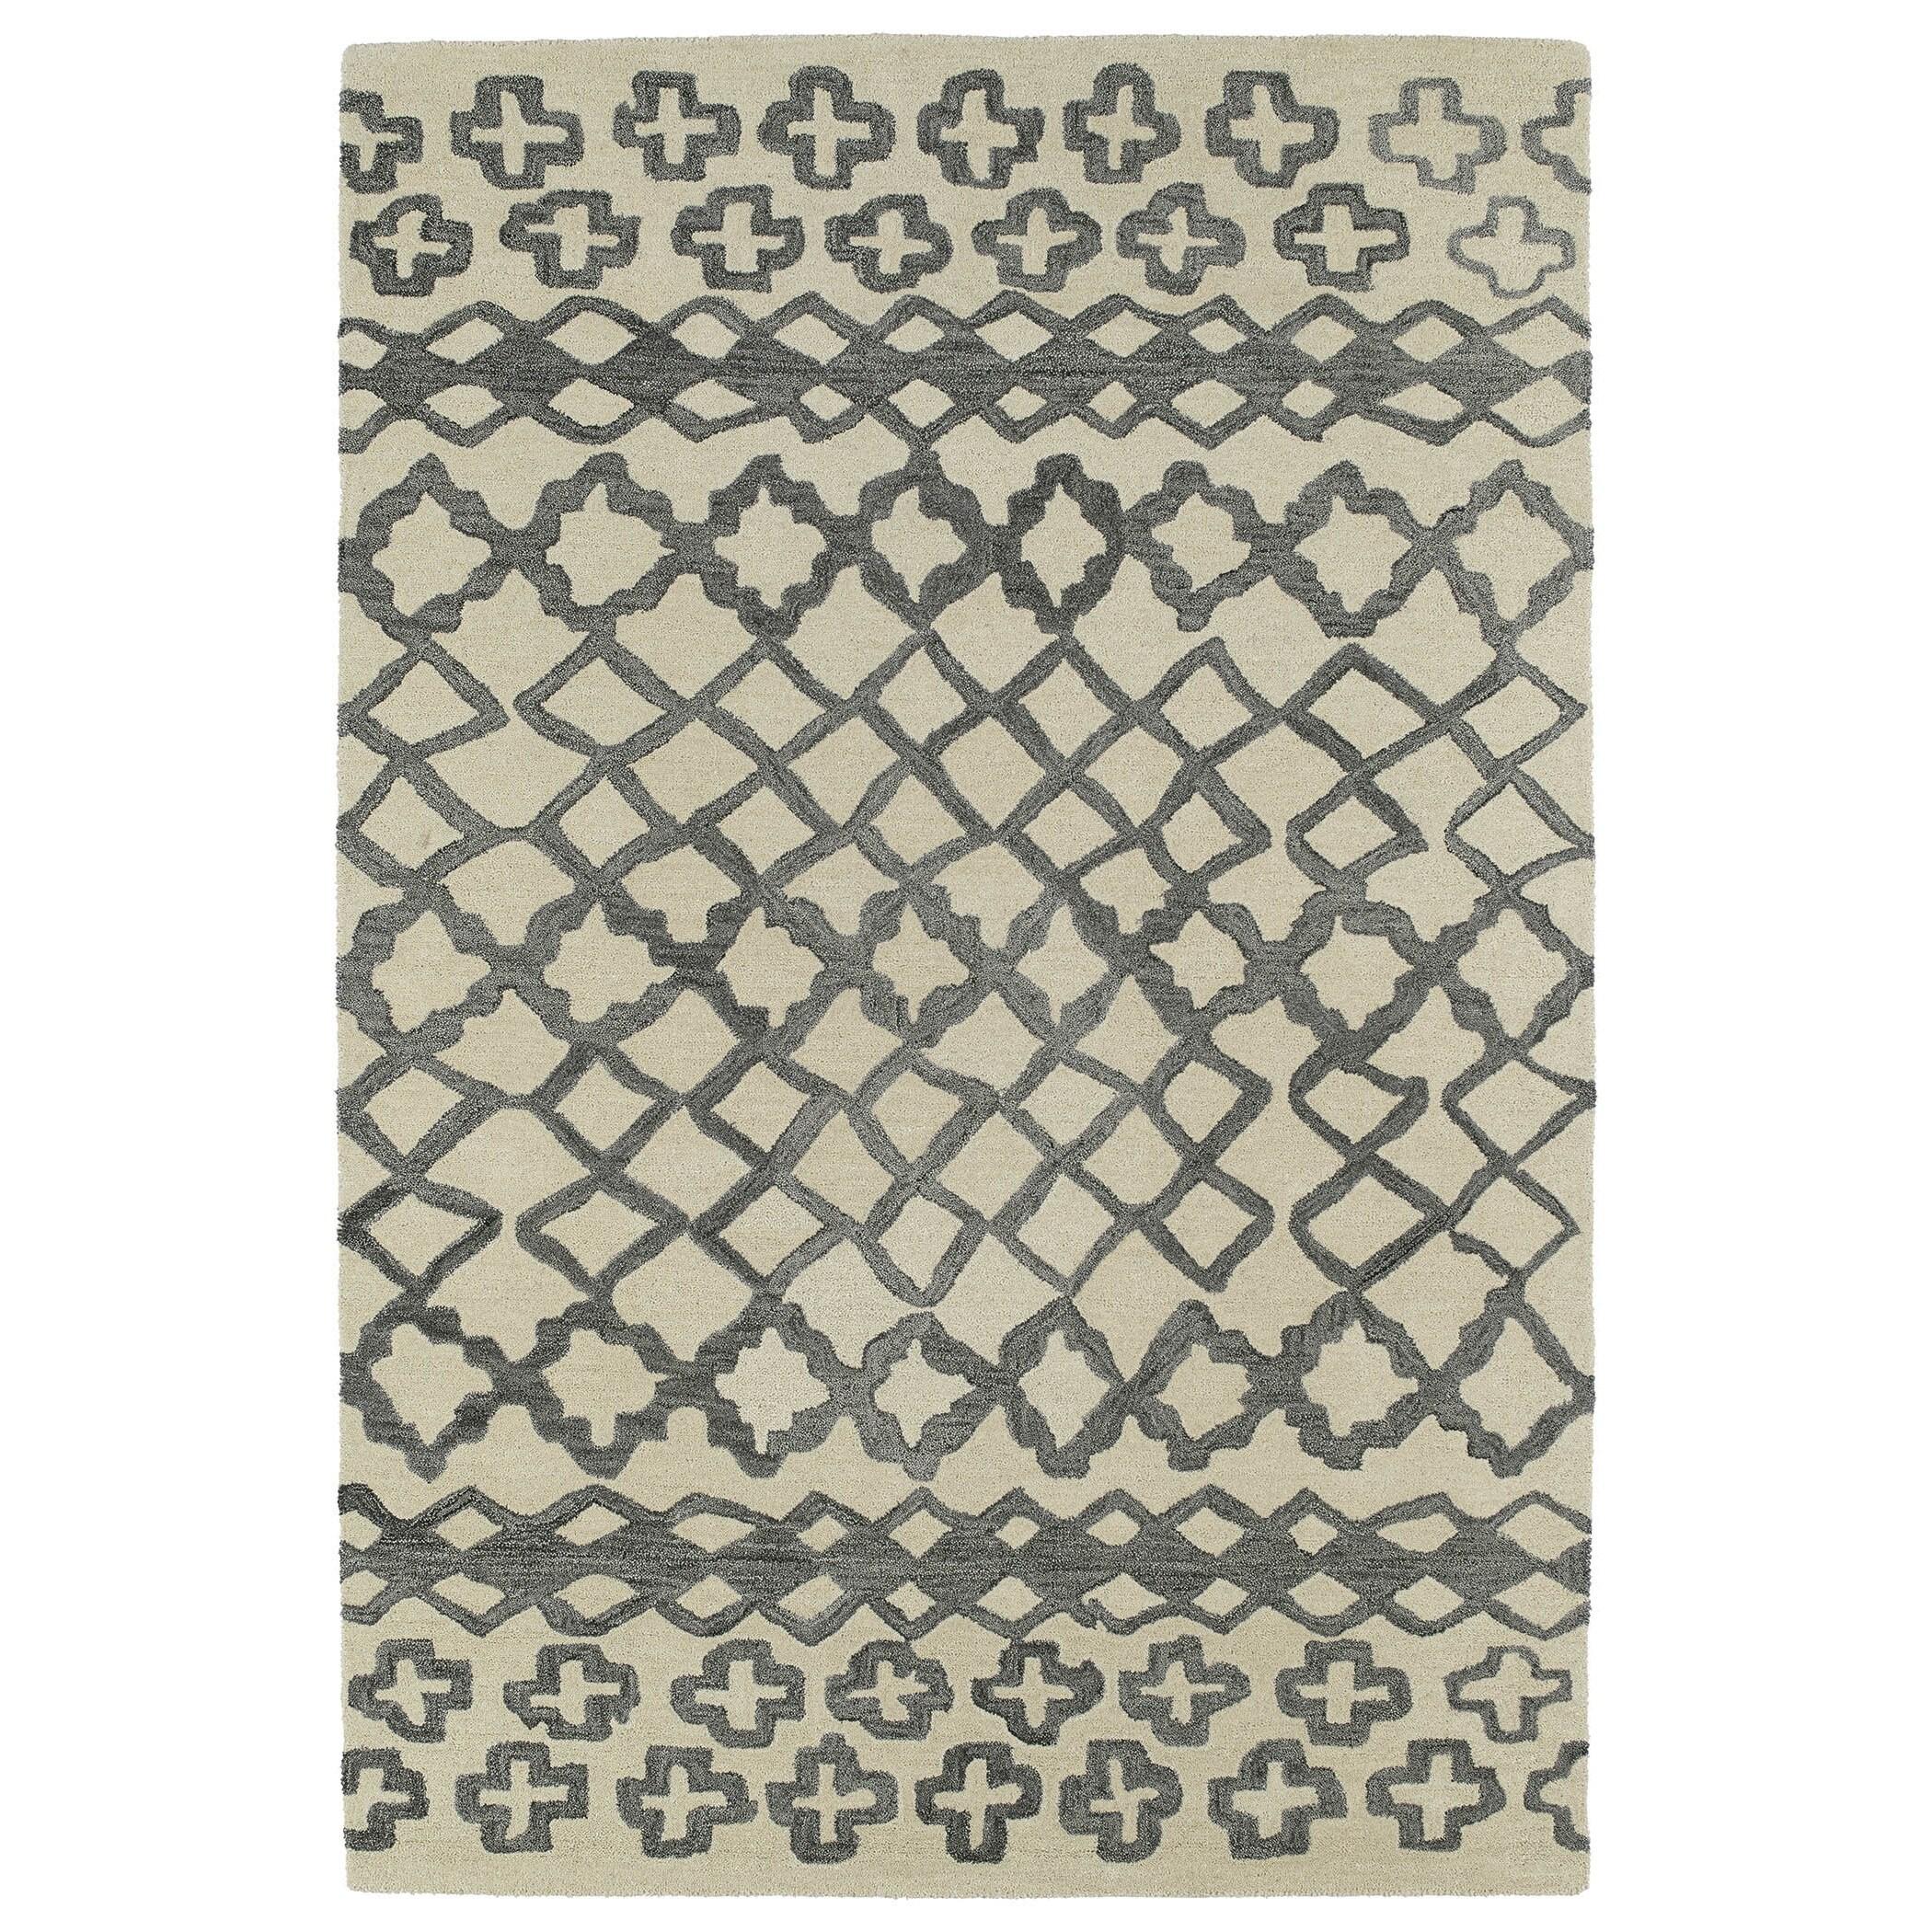 Hand-tufted Utopia Prints Grey Wool Rug (2' x 3') at Sears.com